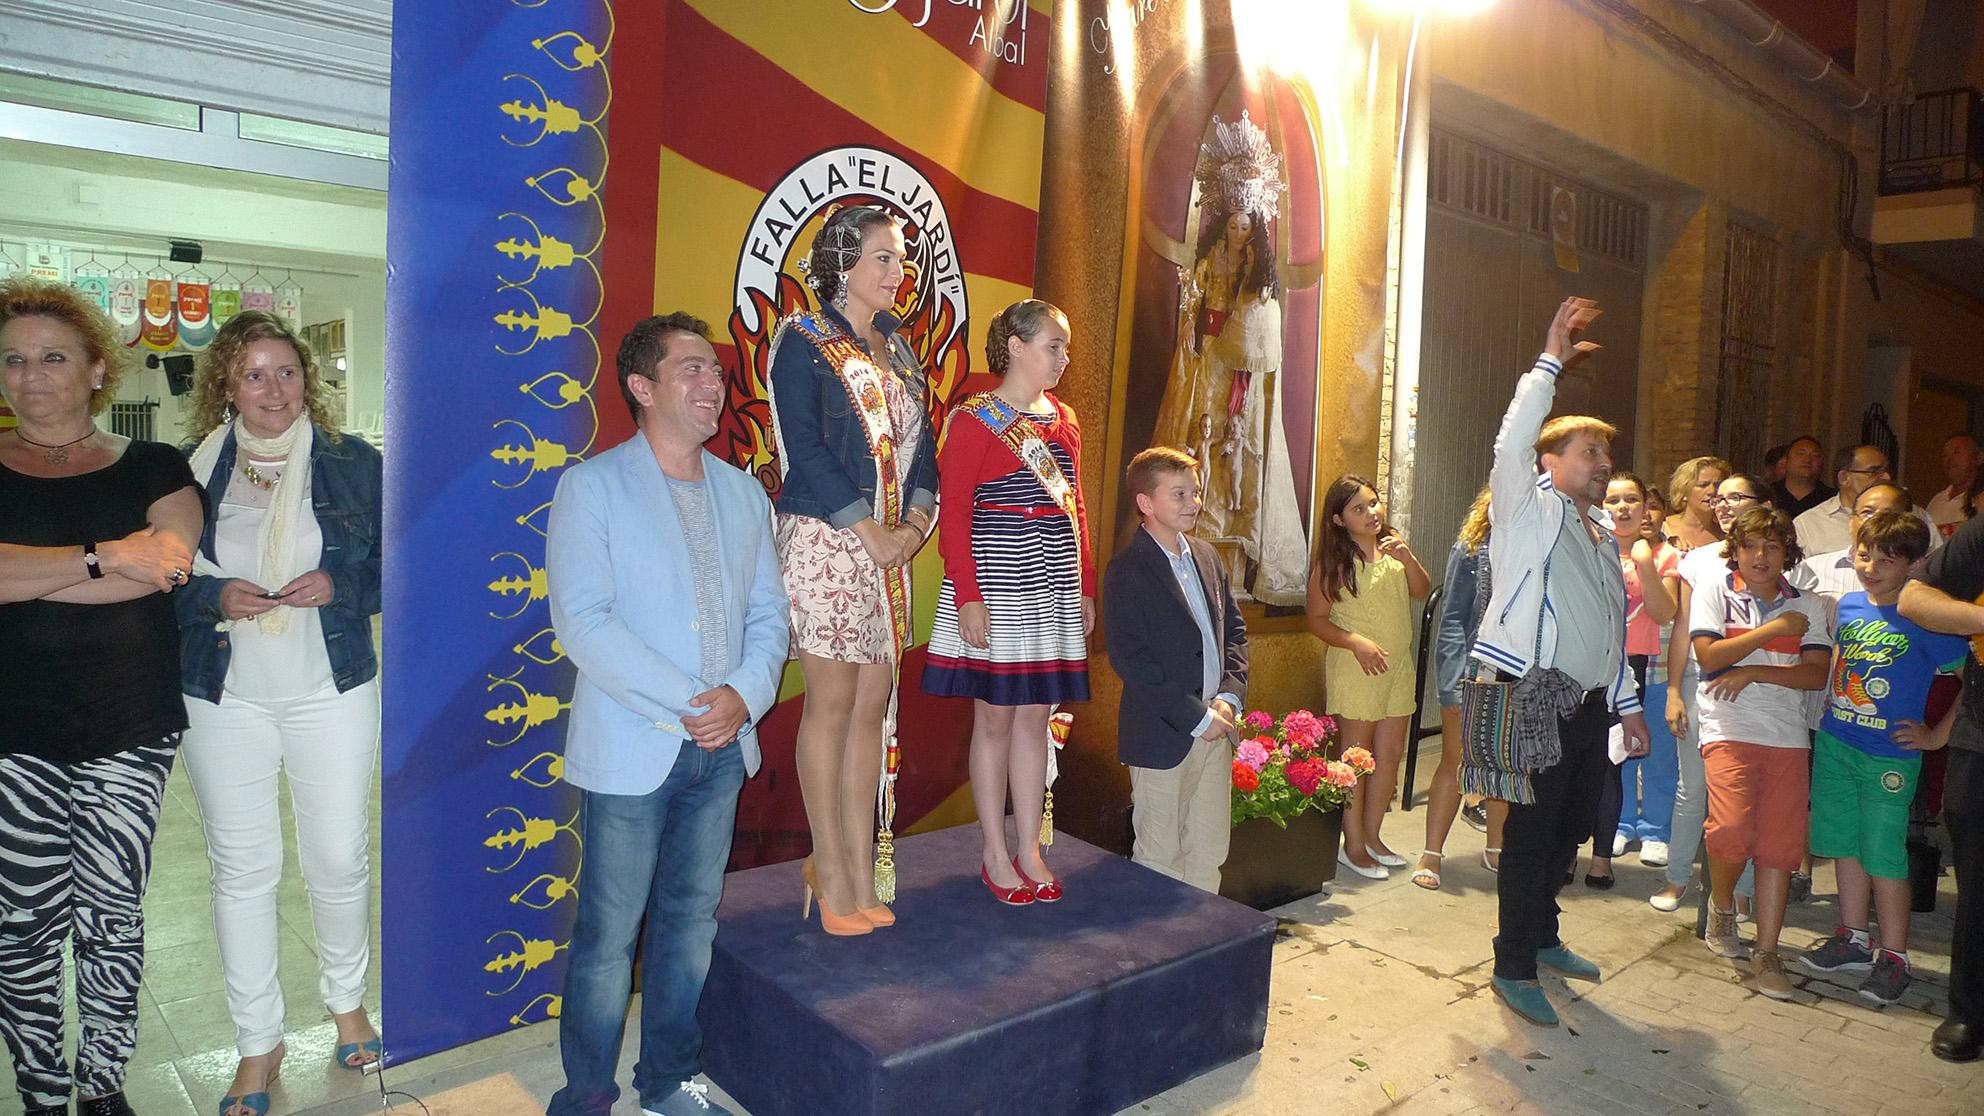 2014-06-07-Albaes d'Albal-Desemparats07 (49)